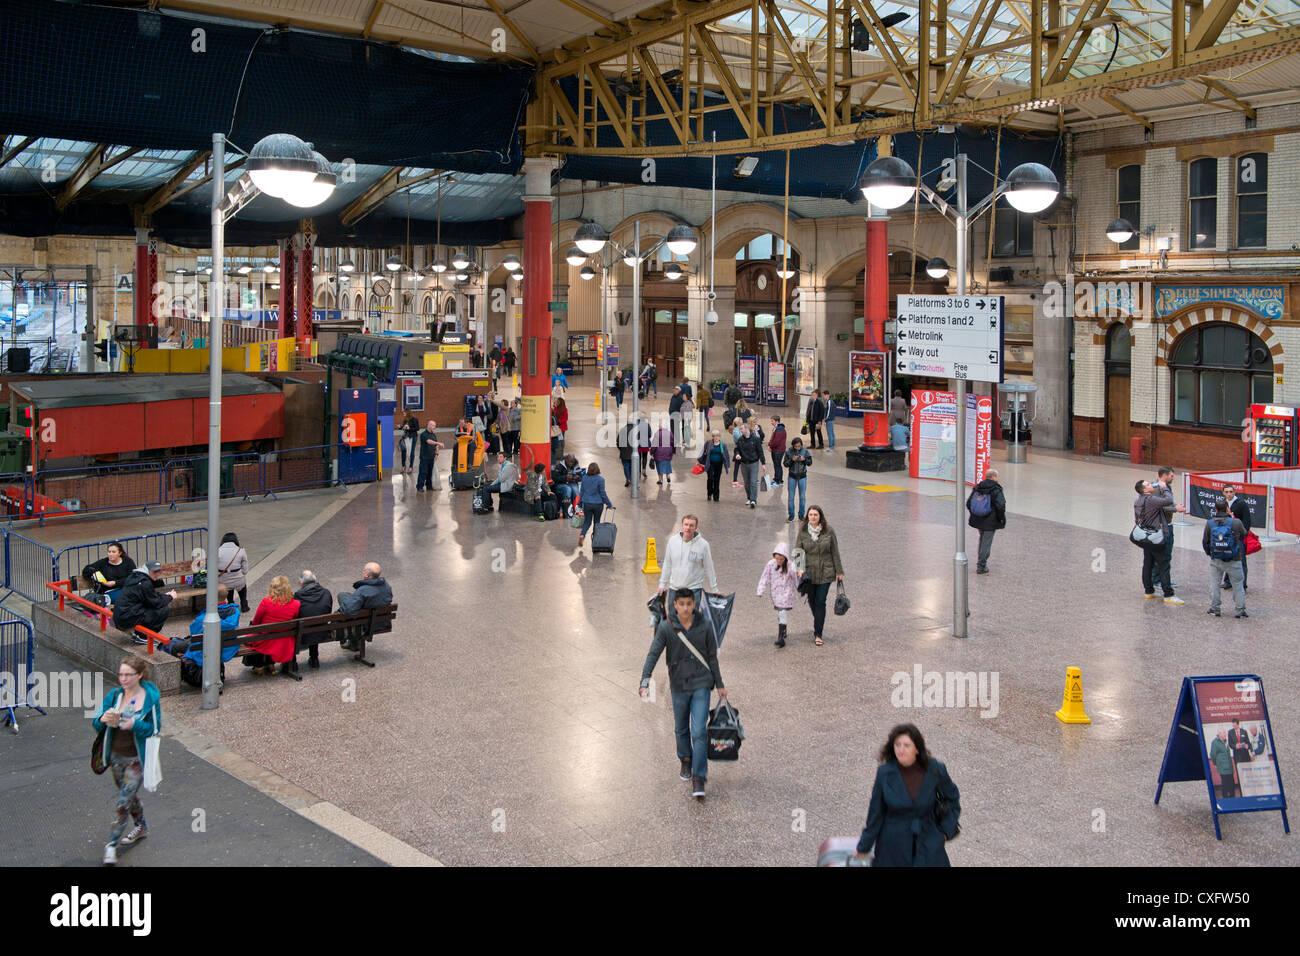 Foyer Entrance News : The inside foyer main entrance hall of victoria rail